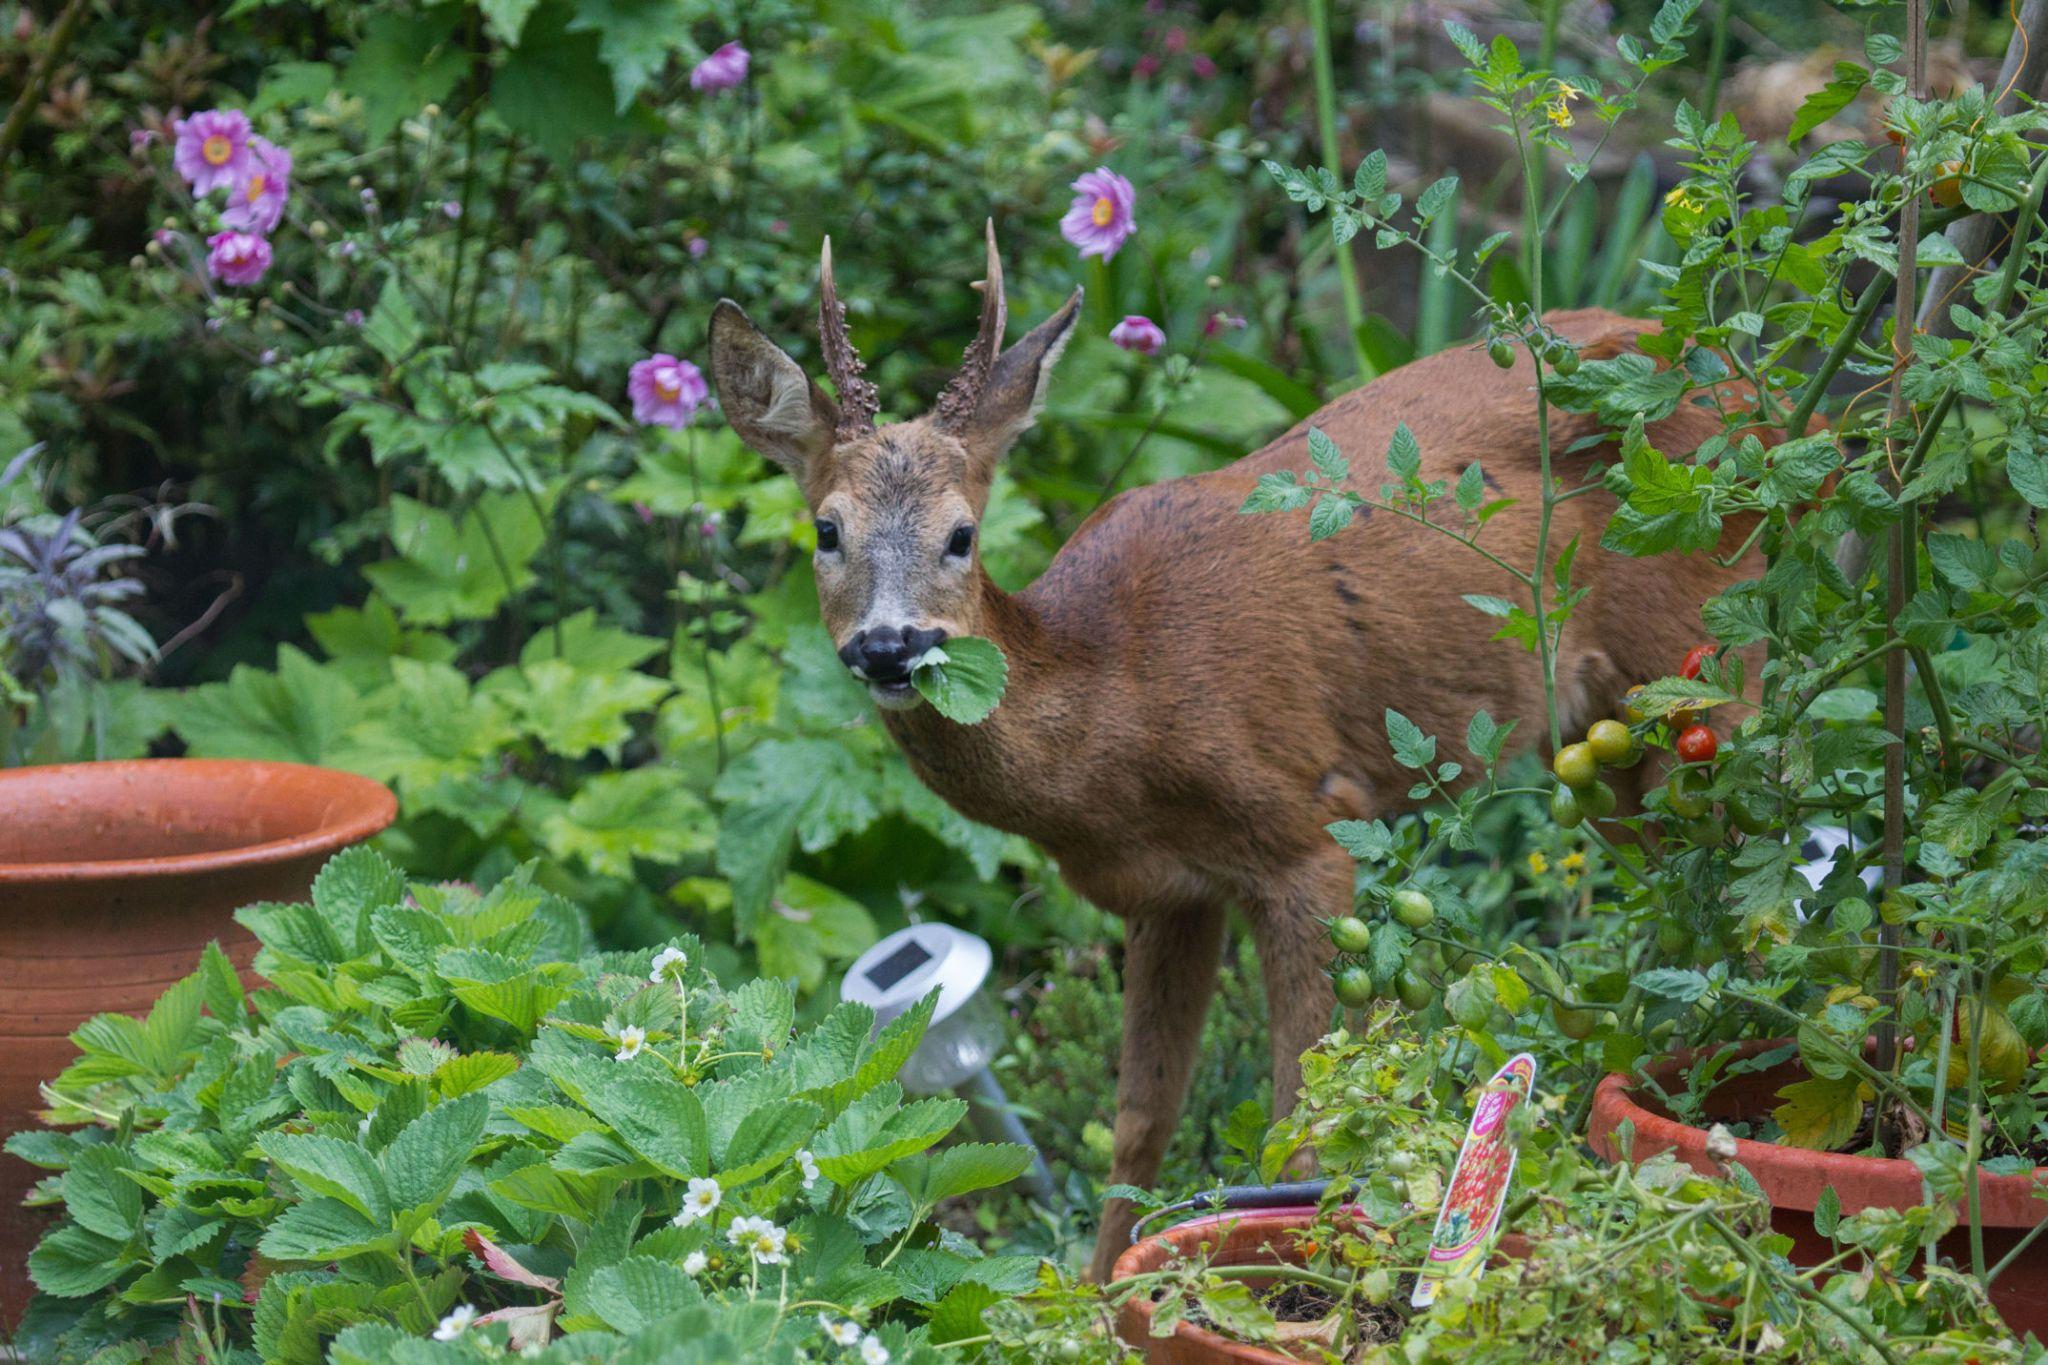 Nothingu0027s Foolproof, But Choosing Plants Carefully Can Help Ward Off Hungry  Deer.